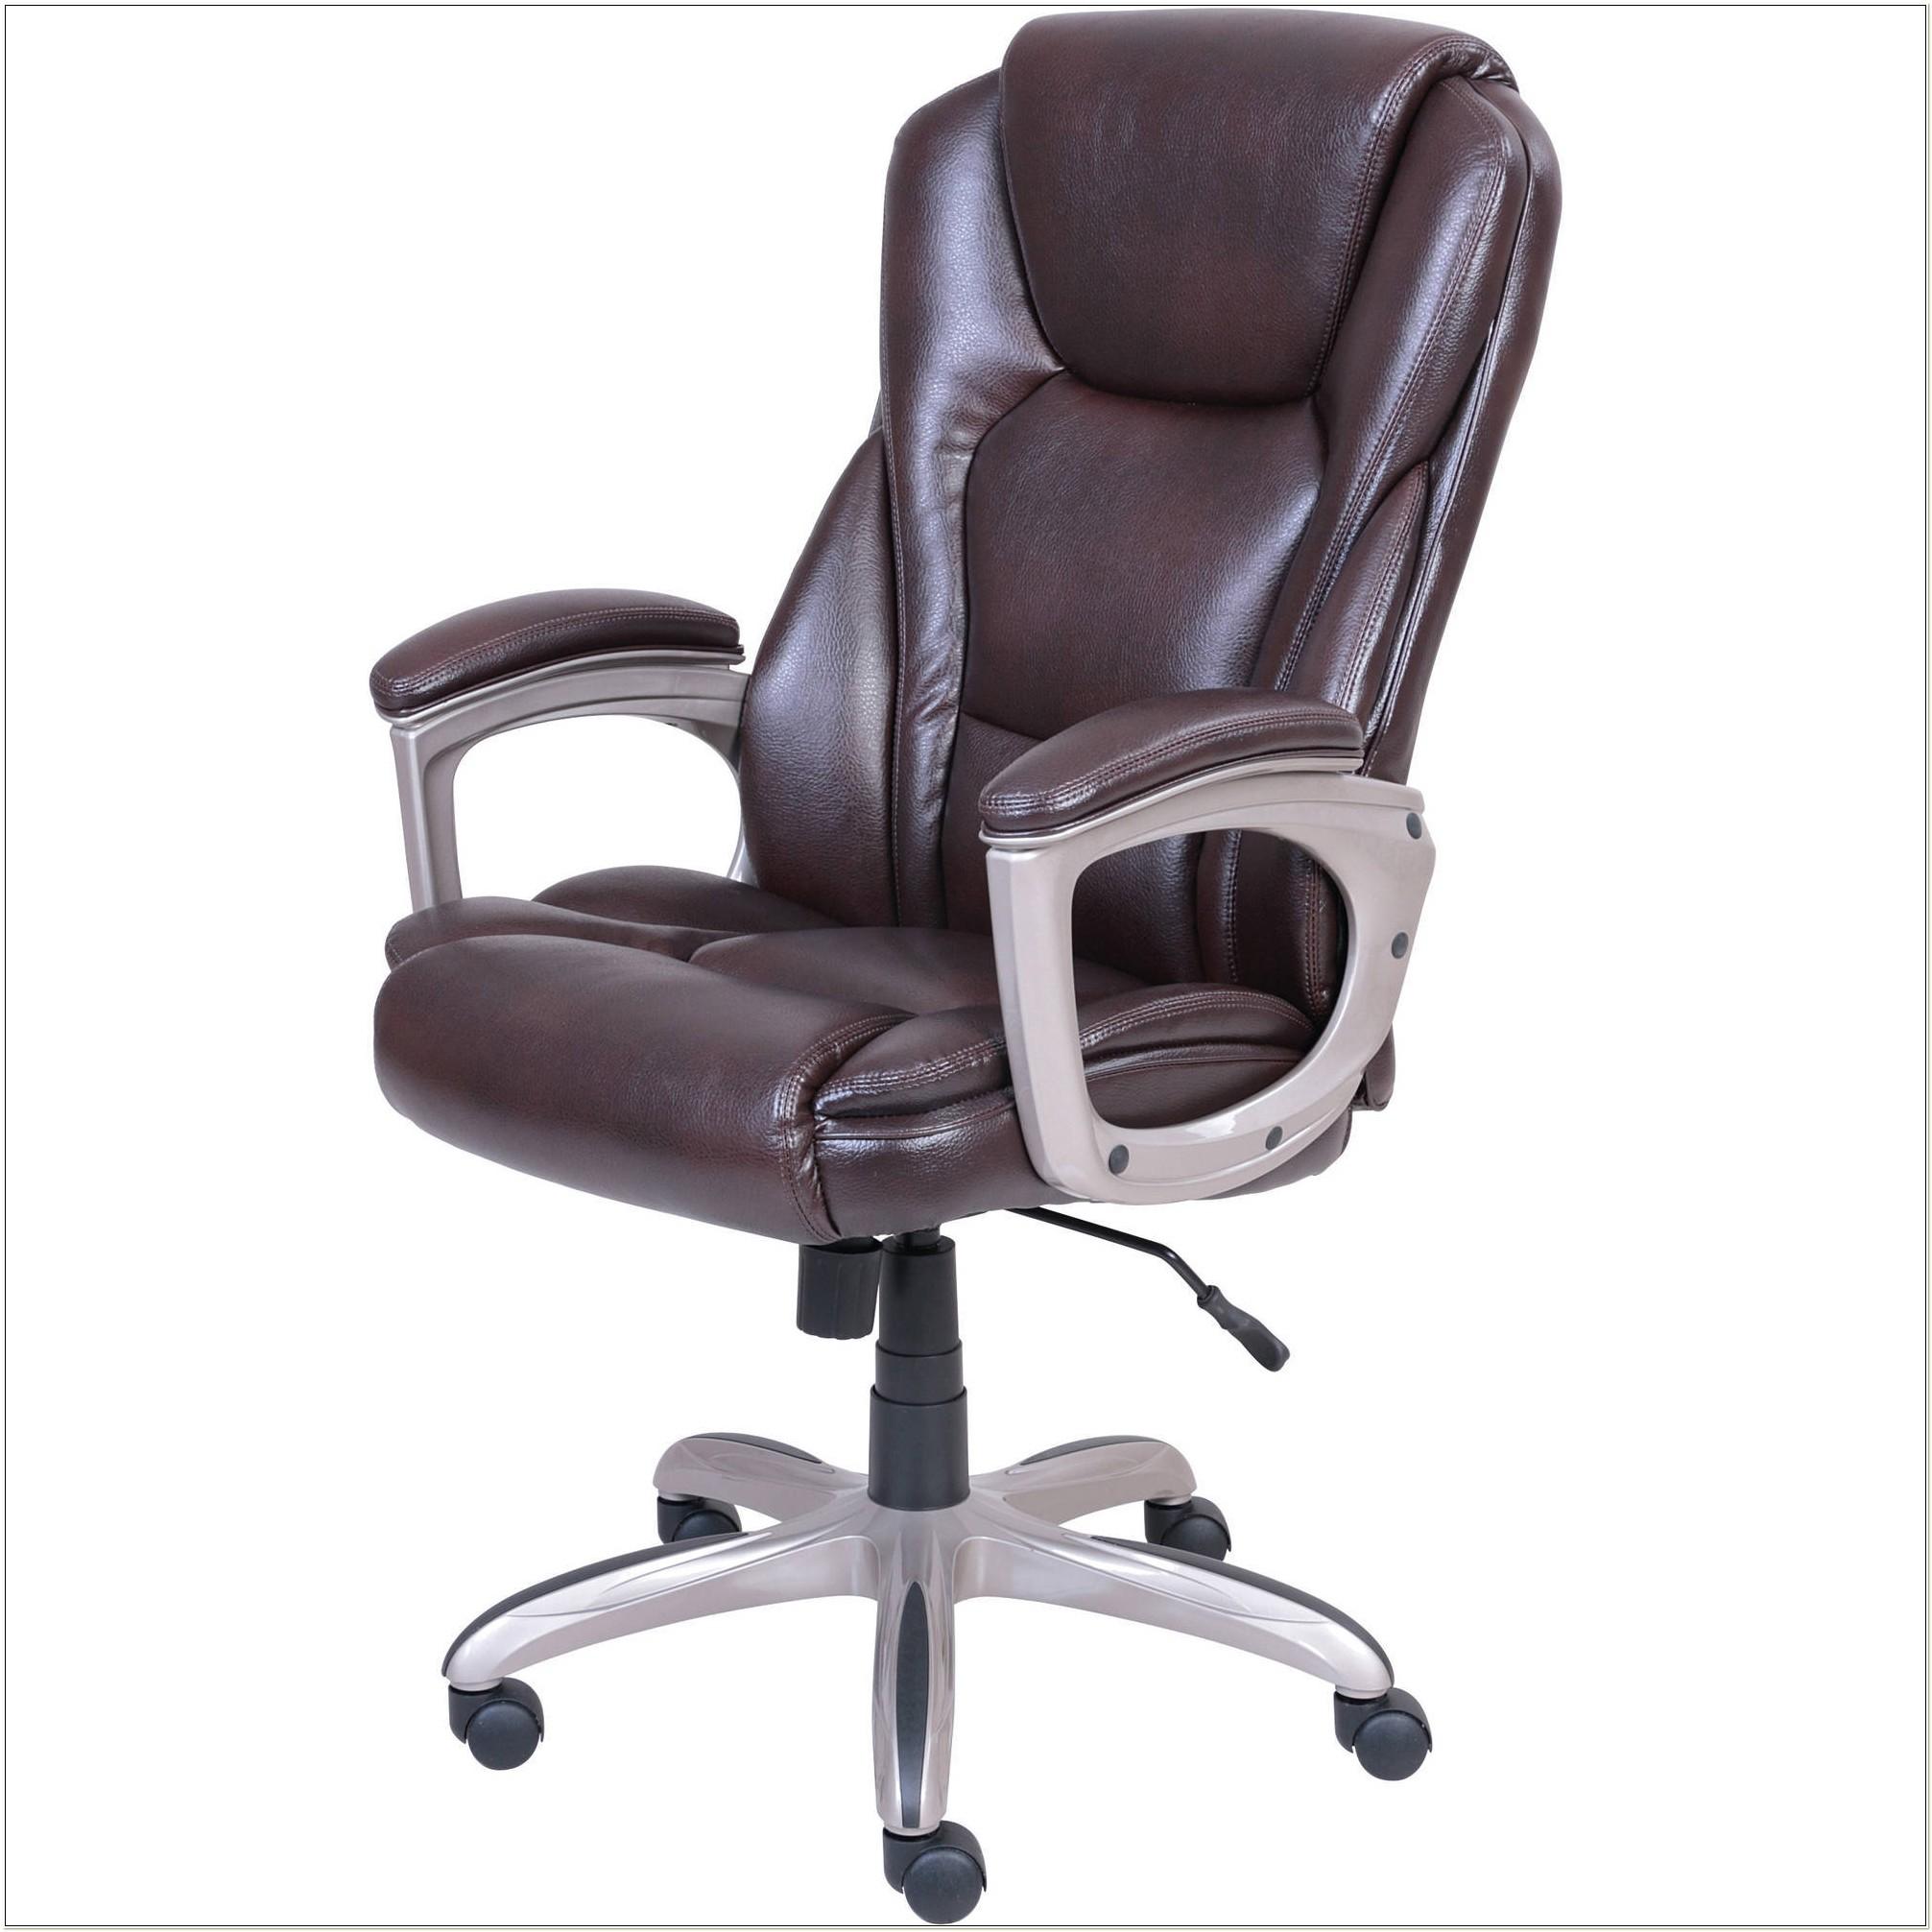 Serta Executive High Back Chair 8995